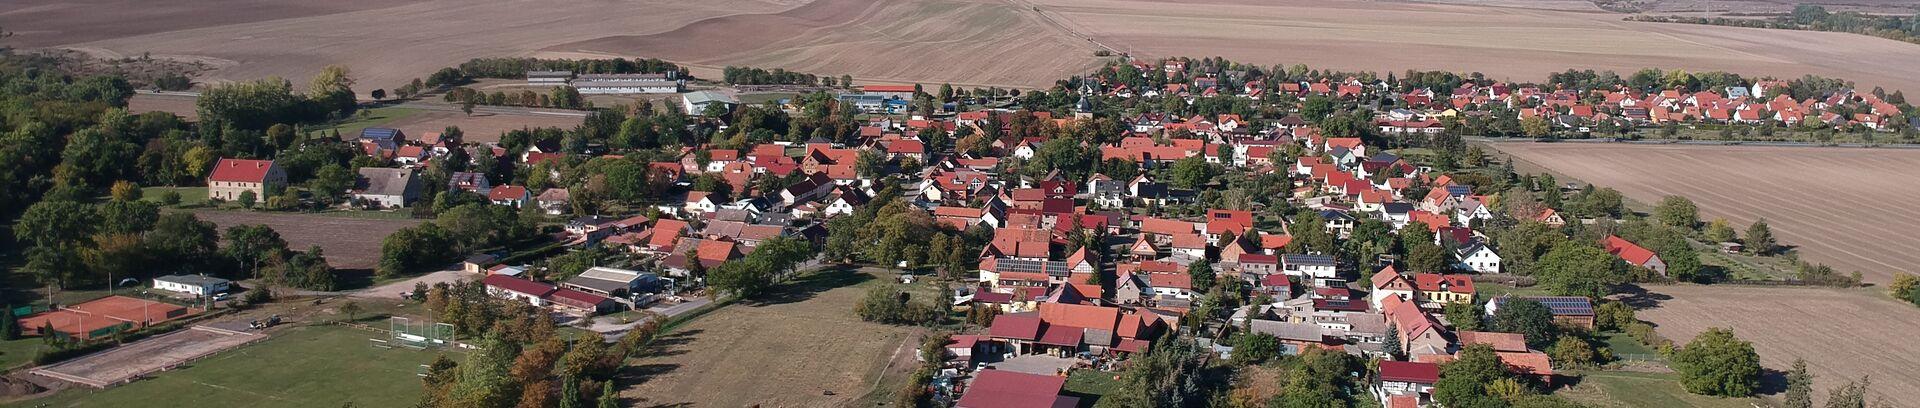 Gemeinde Wundersleben